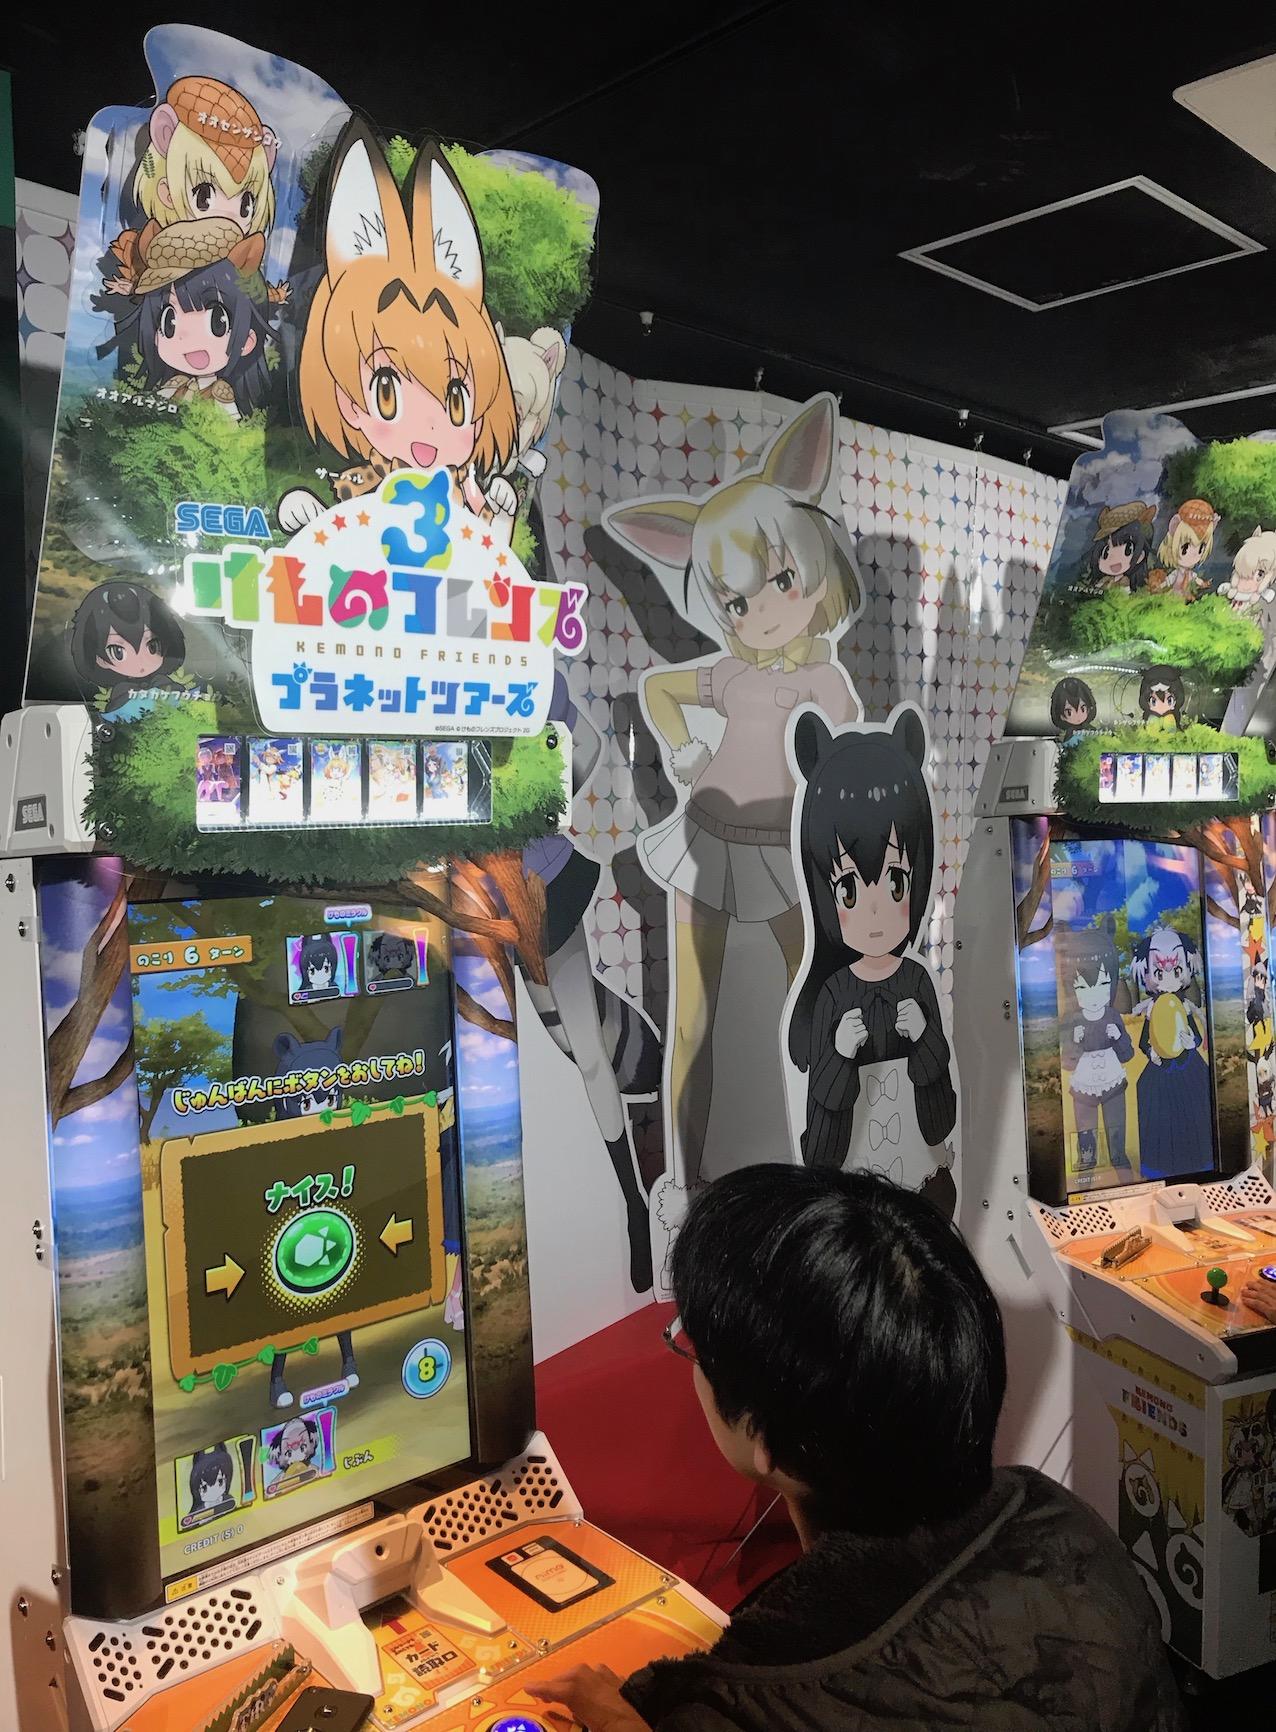 Kemono friends trial session Sega 3 Arcade Akihabara Tokyo